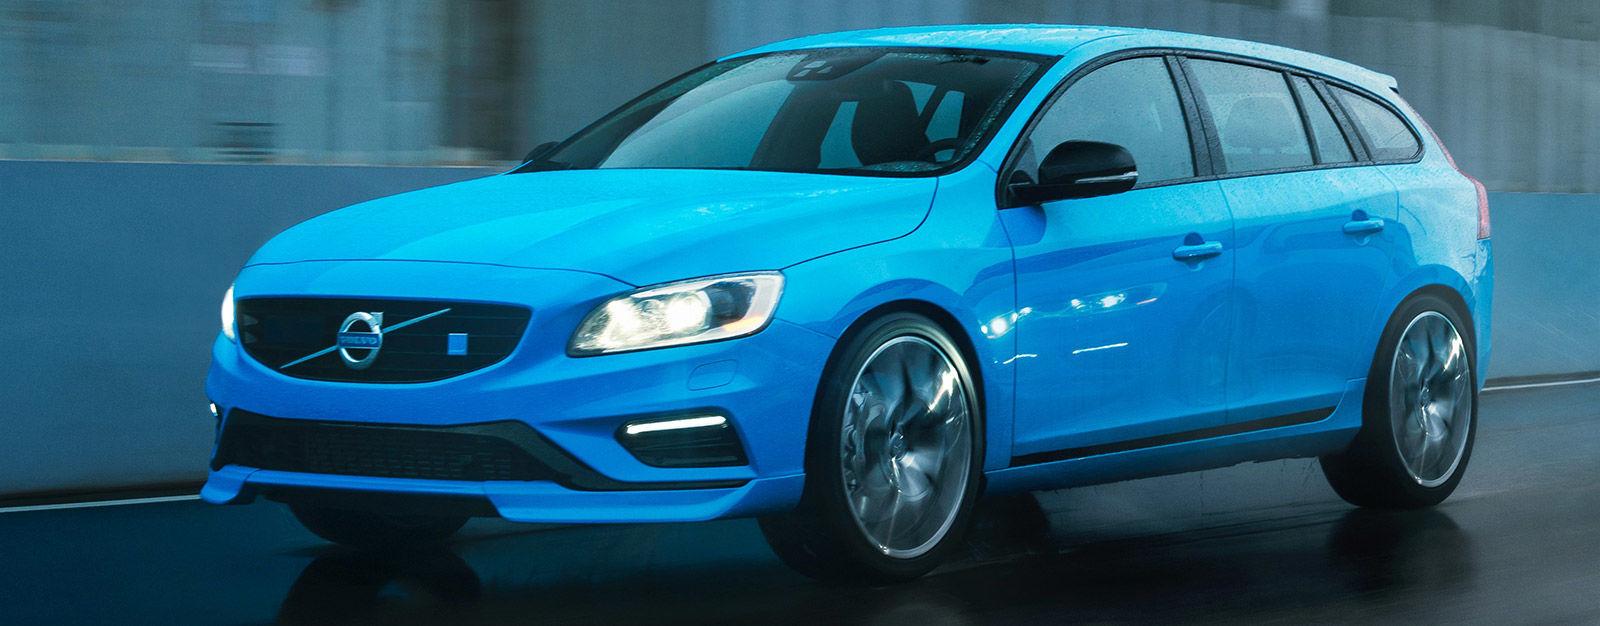 Colour car metallic - Volvo V60 Polestar Rebel Blue